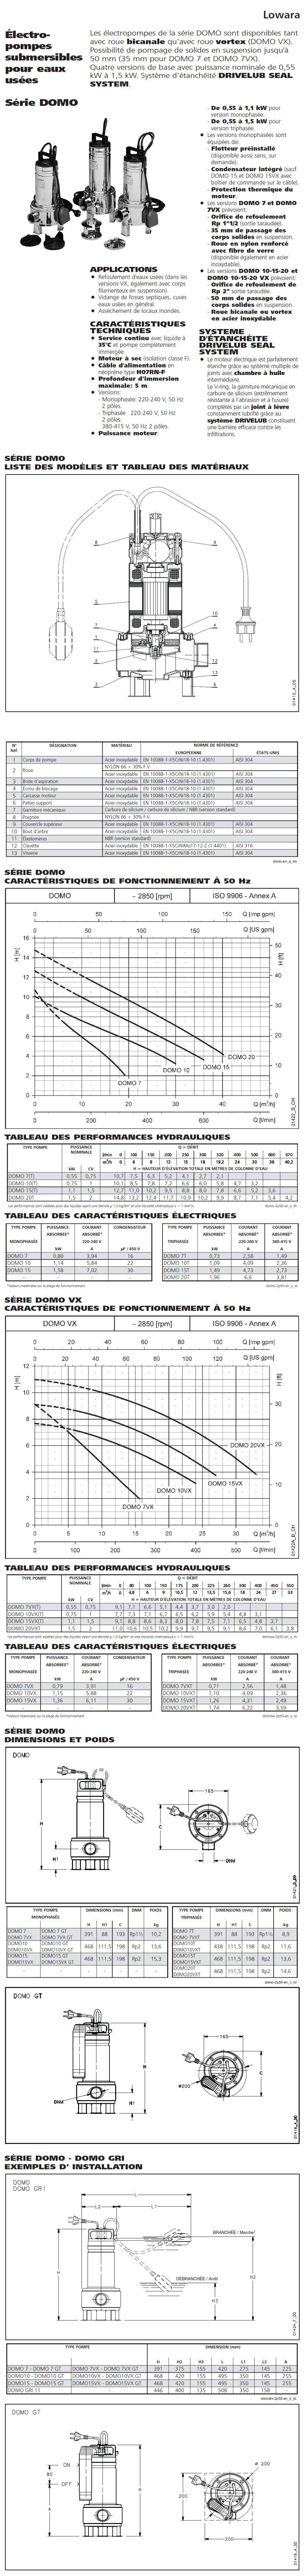 Fiche technique Lowara DOMO10VX